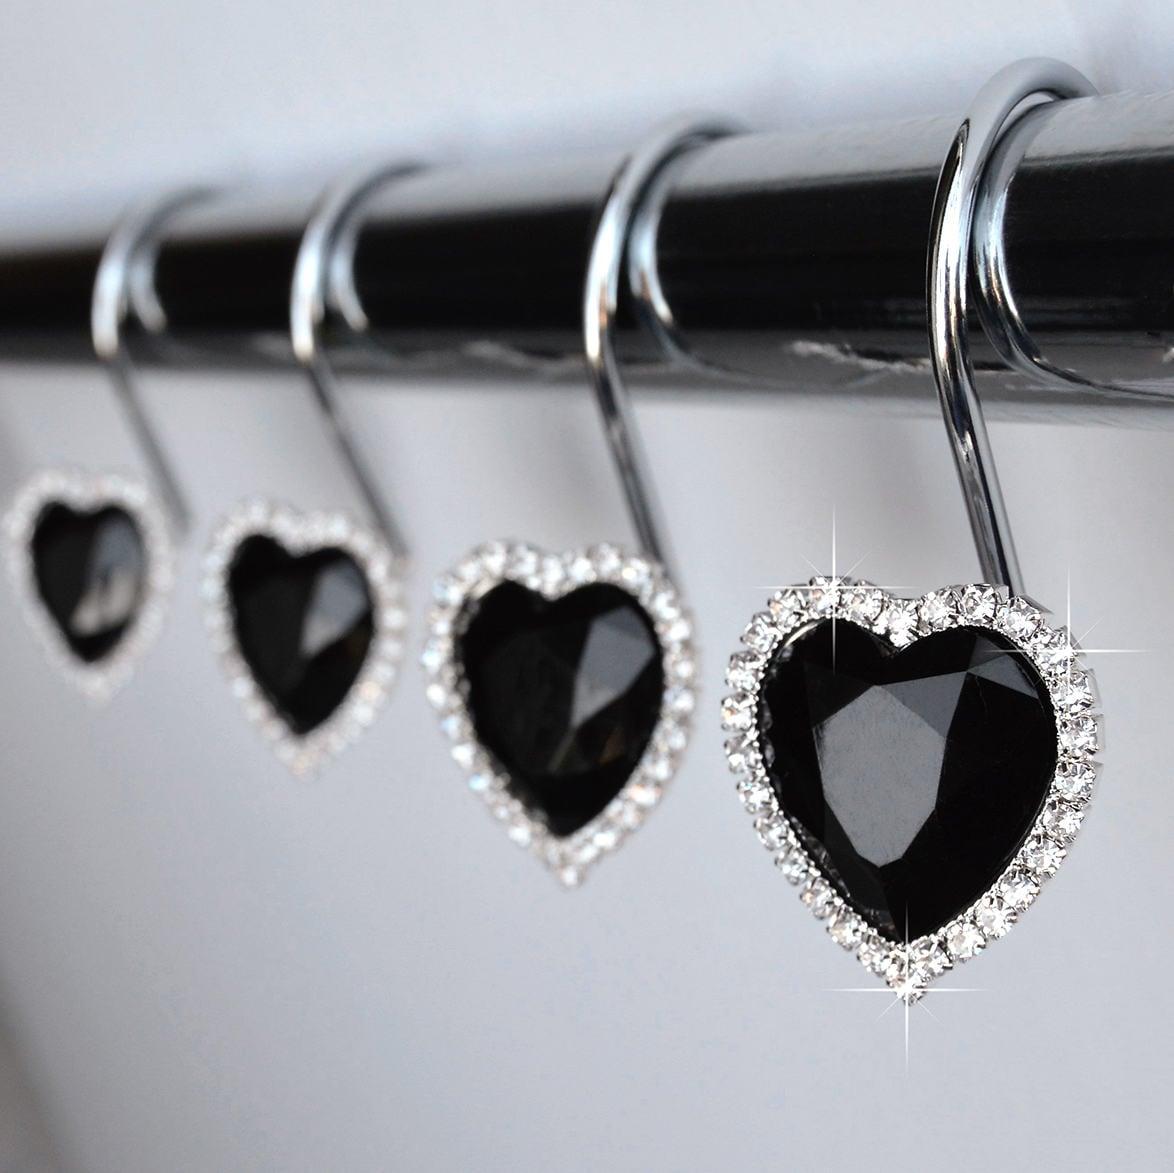 shower curtain hooks rings heart black decorative gems and etsy. Black Bedroom Furniture Sets. Home Design Ideas